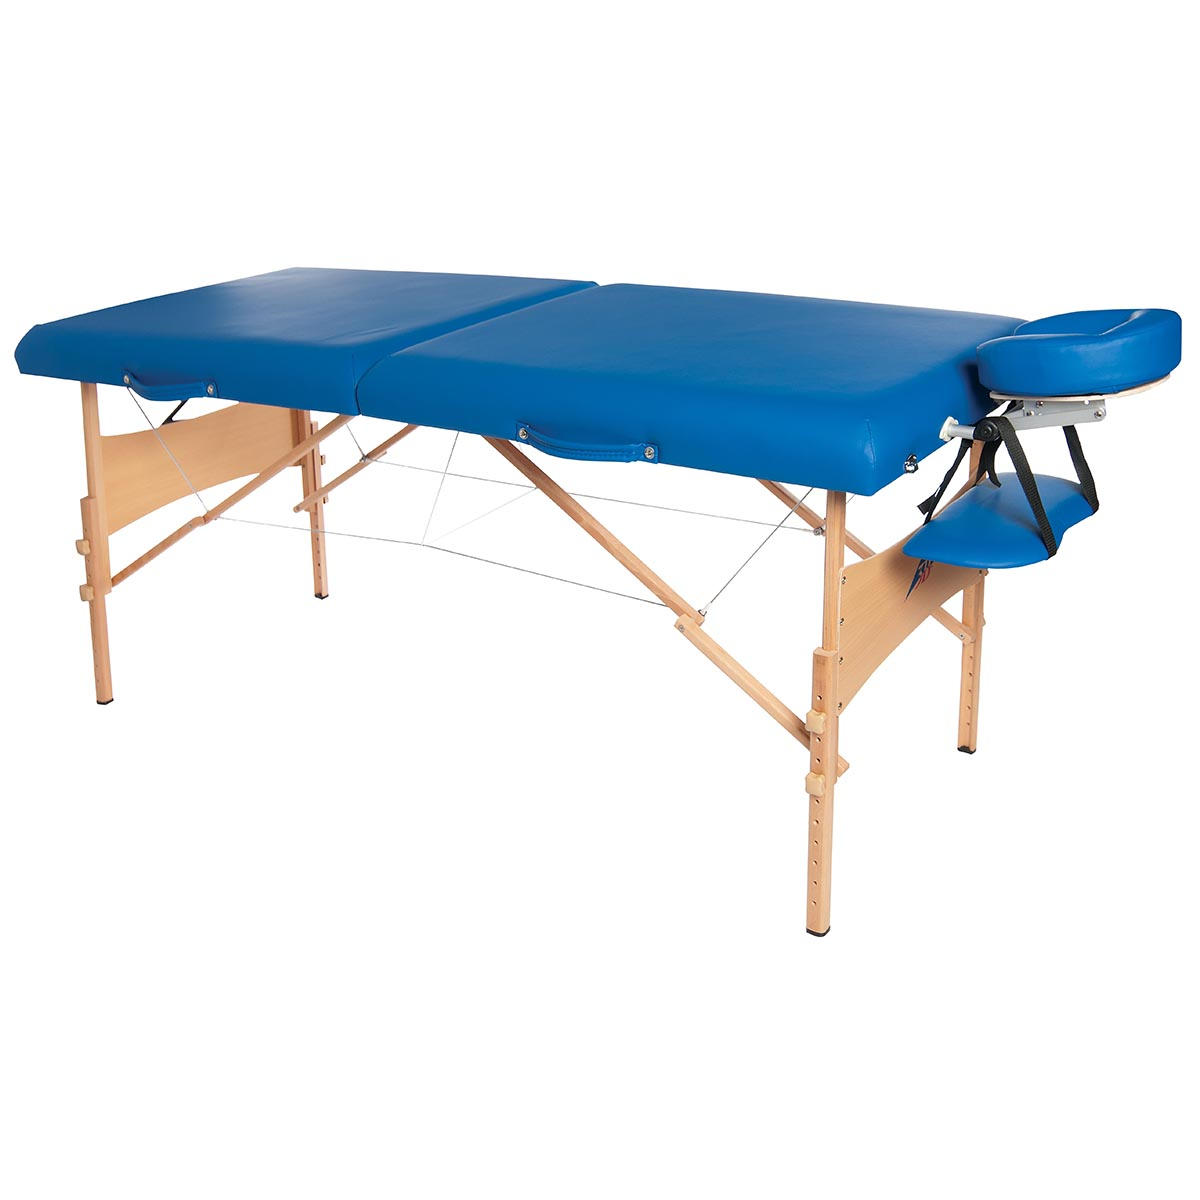 table de massage pliante kin sith rapie ost opathie. Black Bedroom Furniture Sets. Home Design Ideas